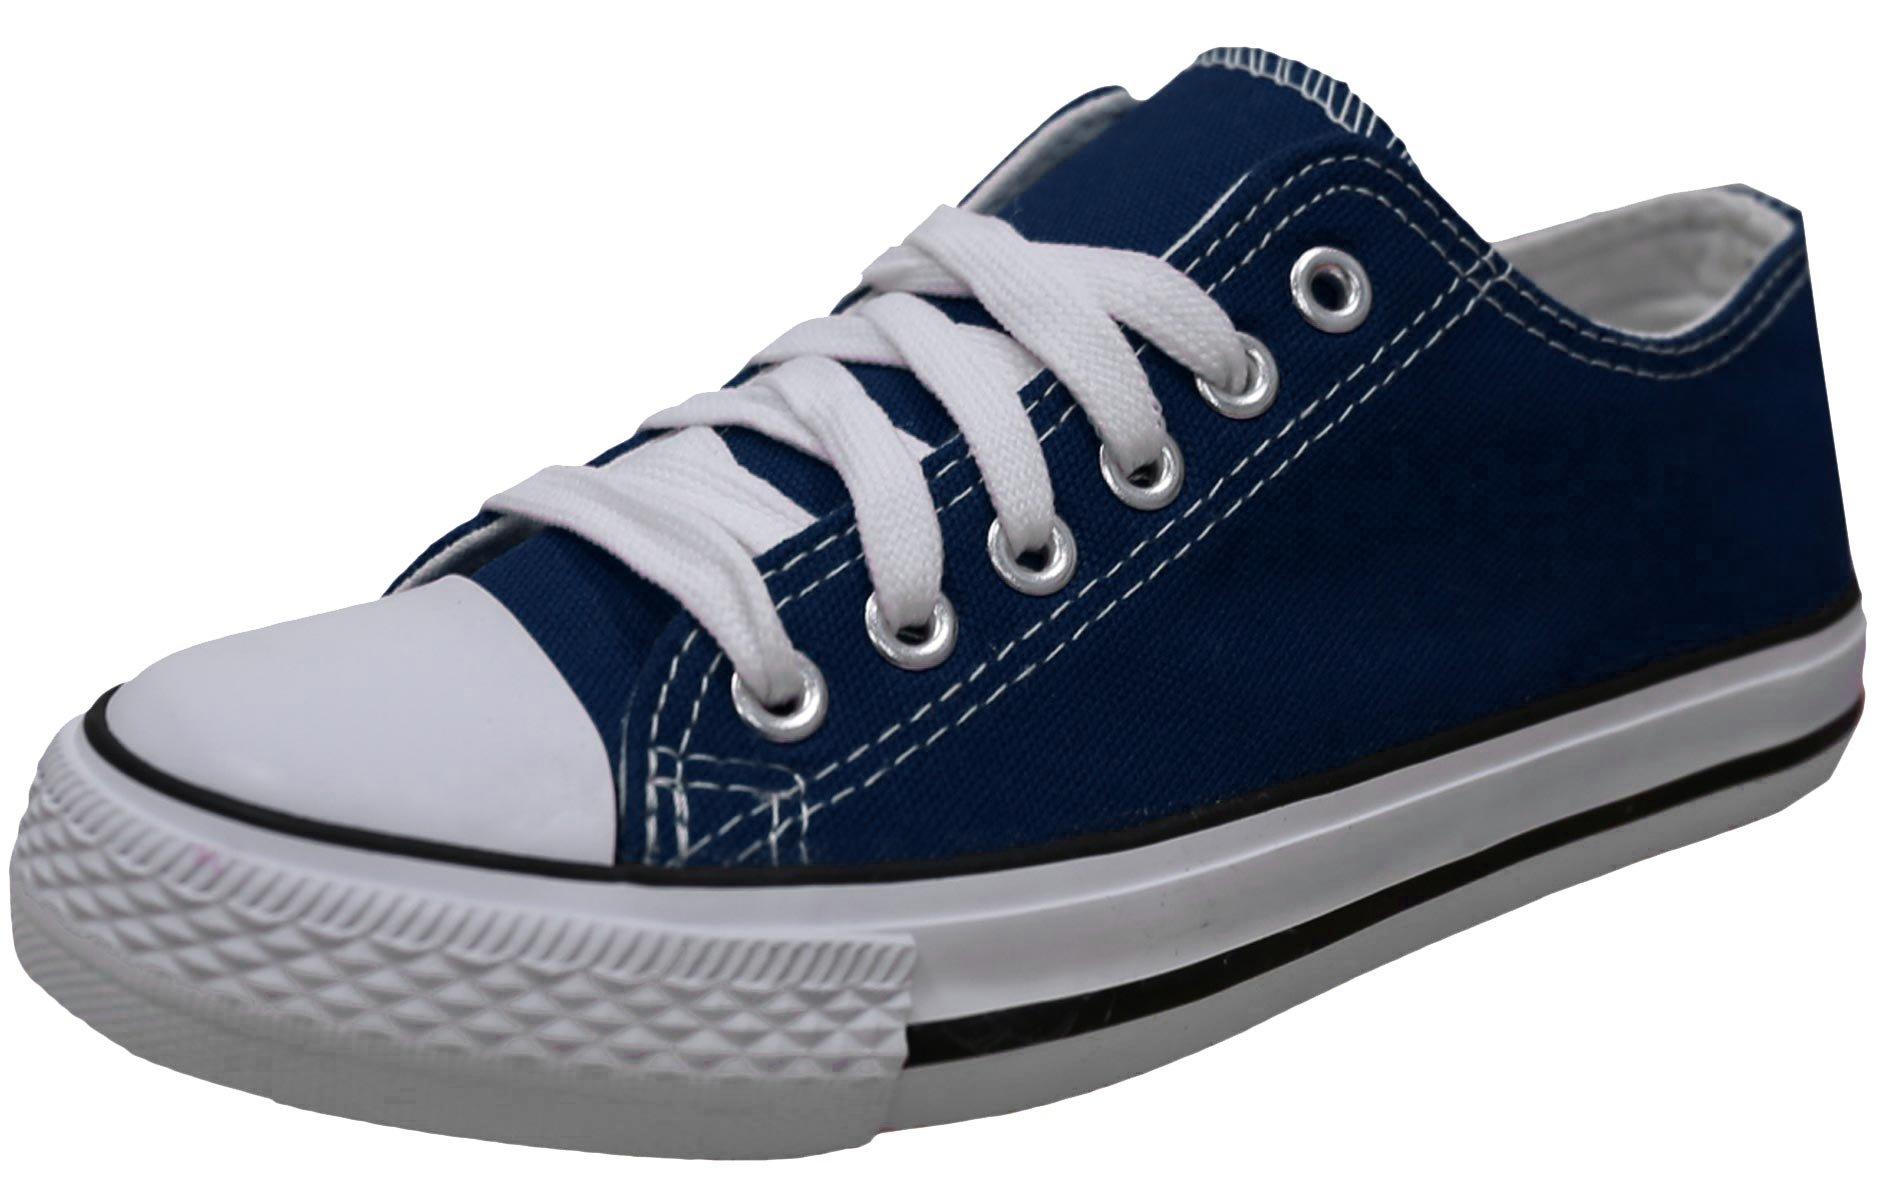 S-3 Women's Low Top Classic Canvas Fashion Sneaker (6 B(M) US, Navy)